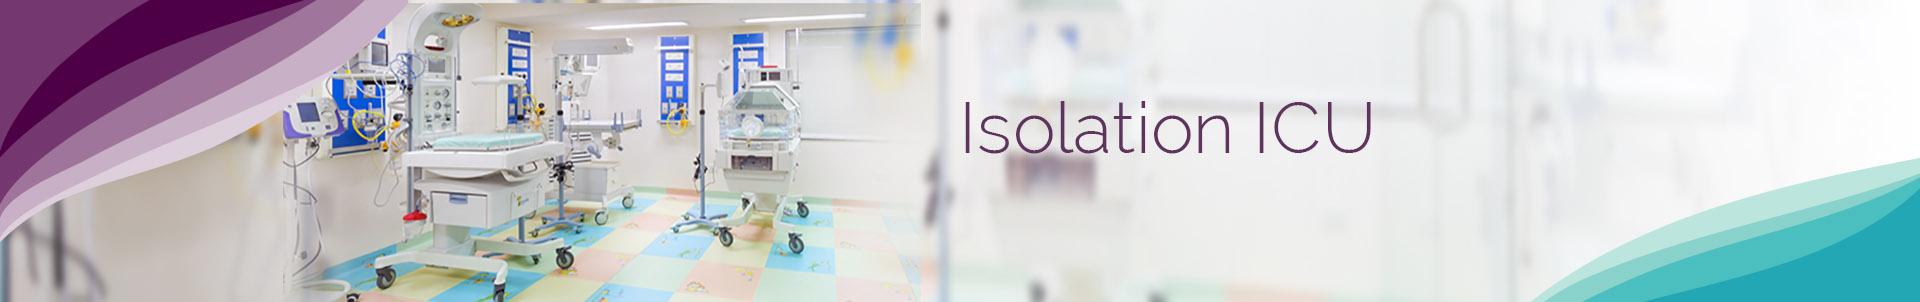 Isolation Icu